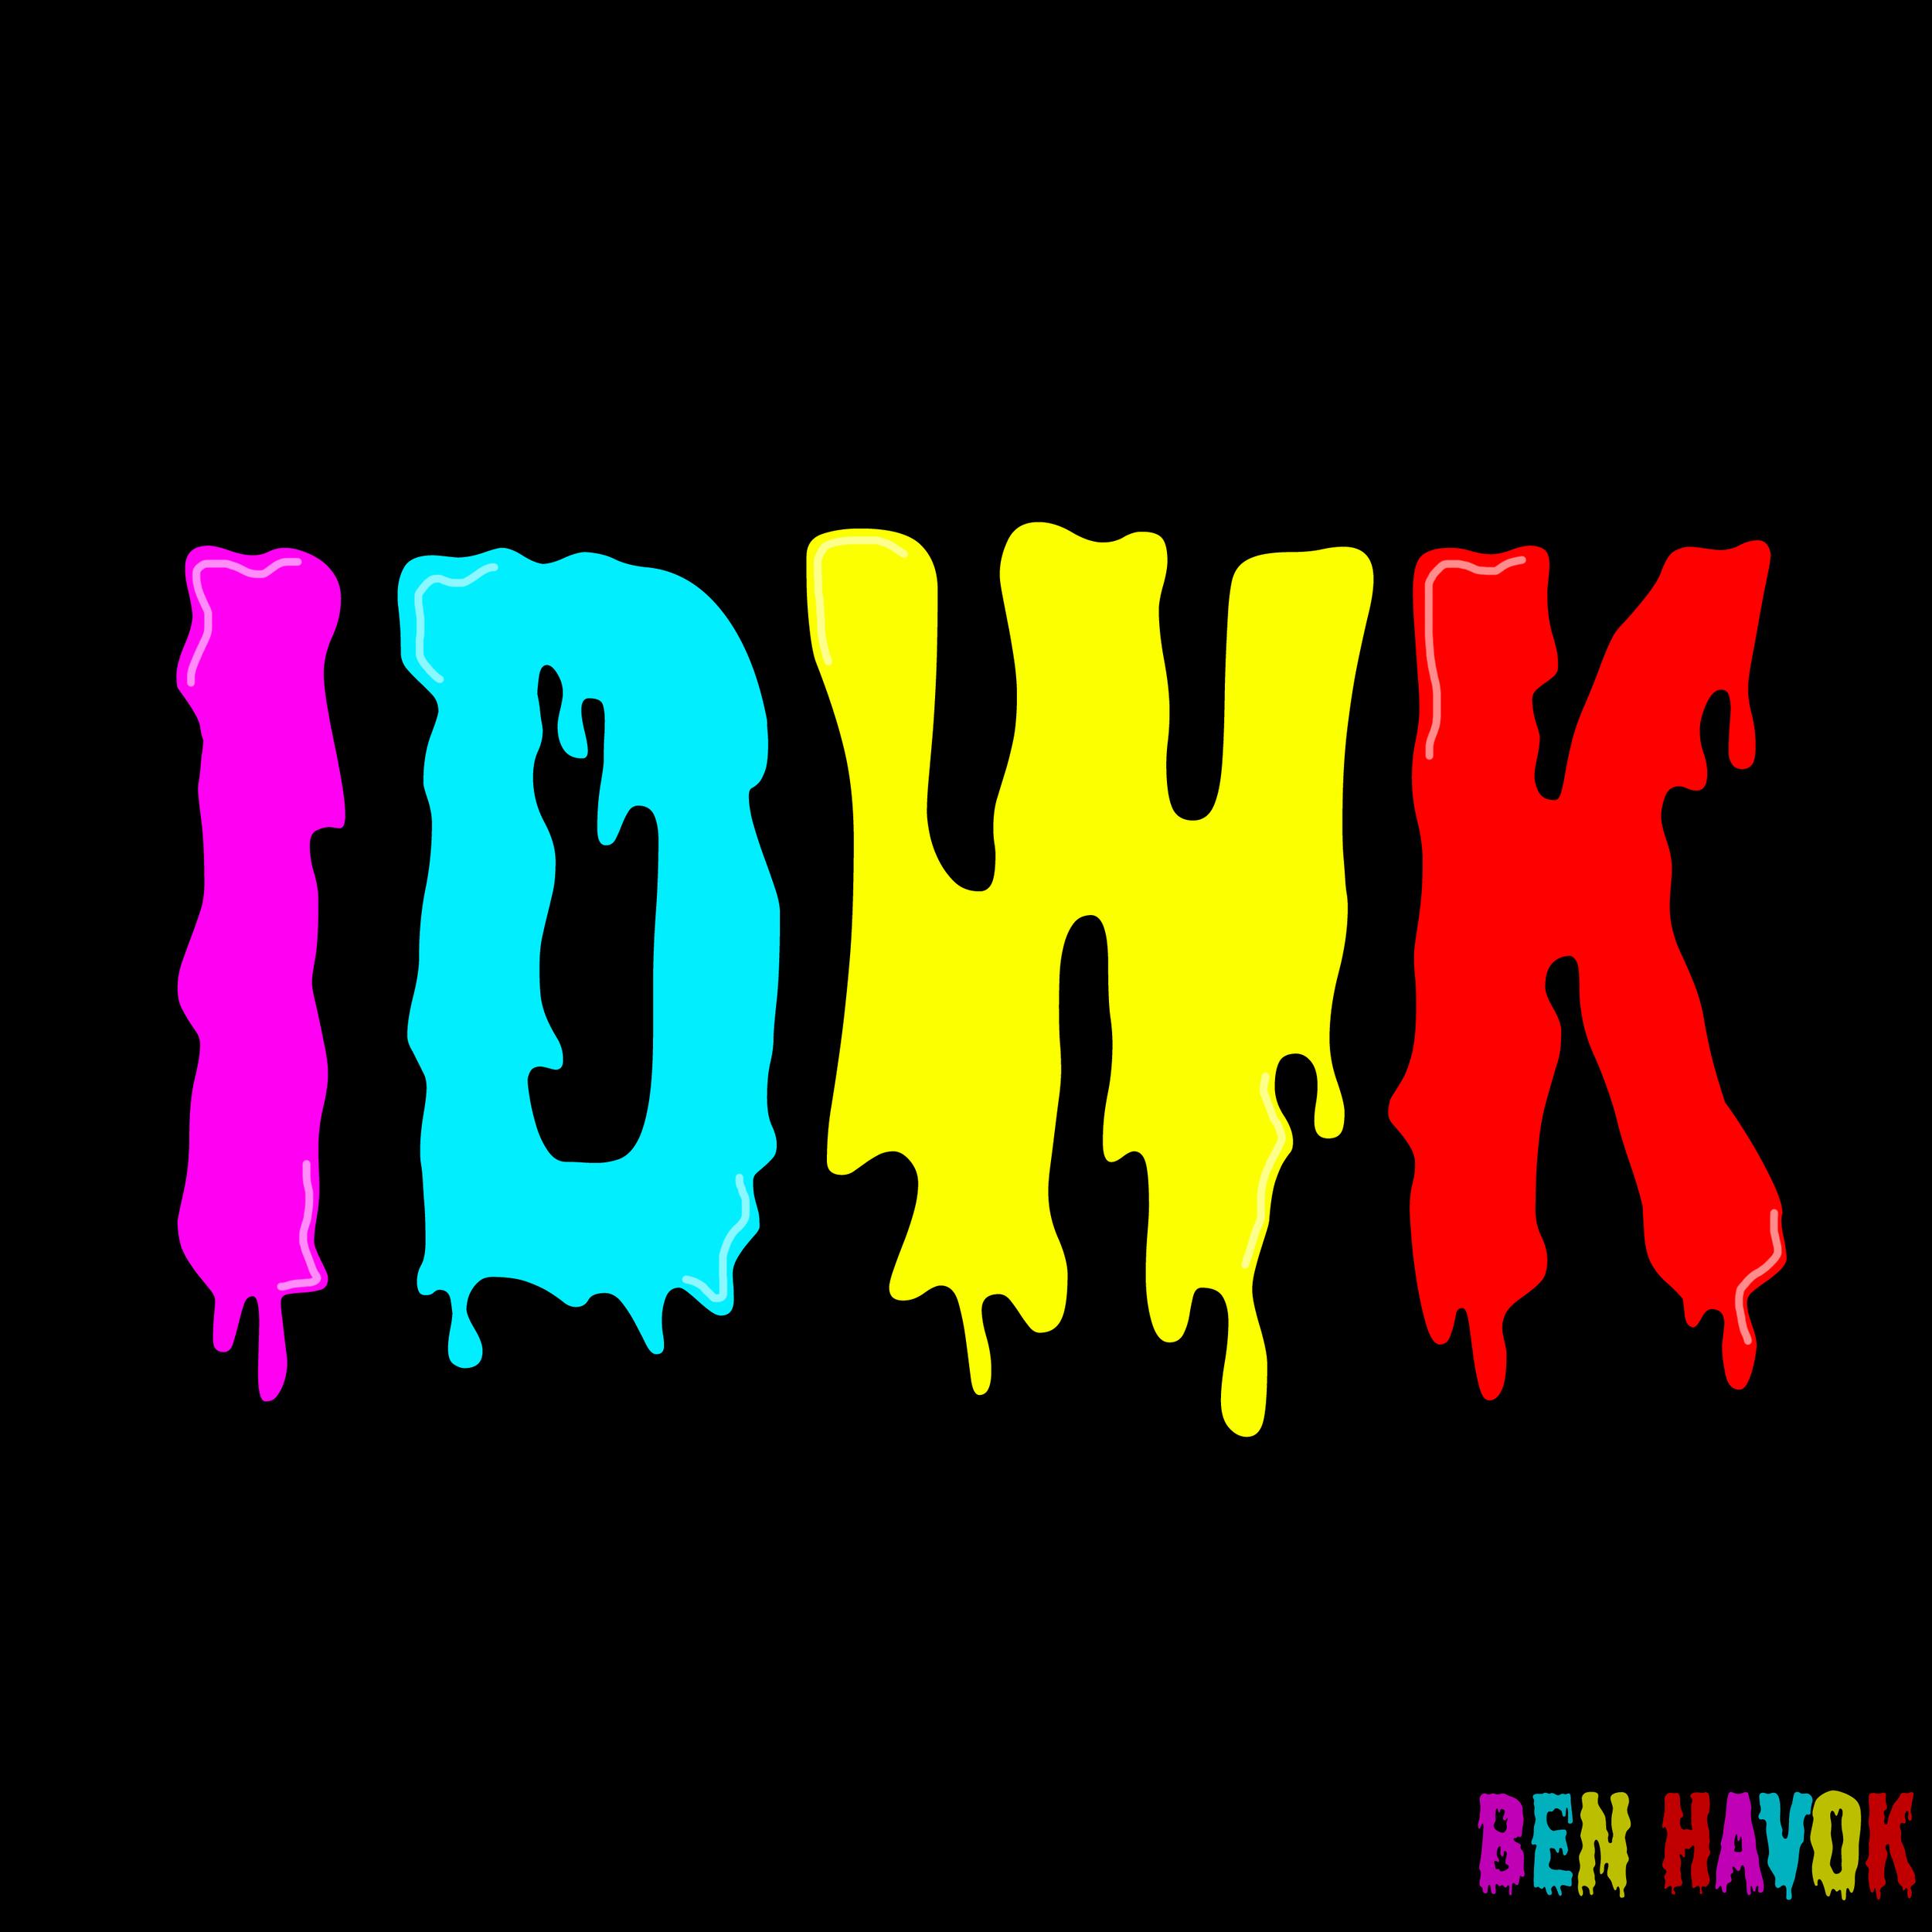 Ben Havok IDWK Cover Art.png